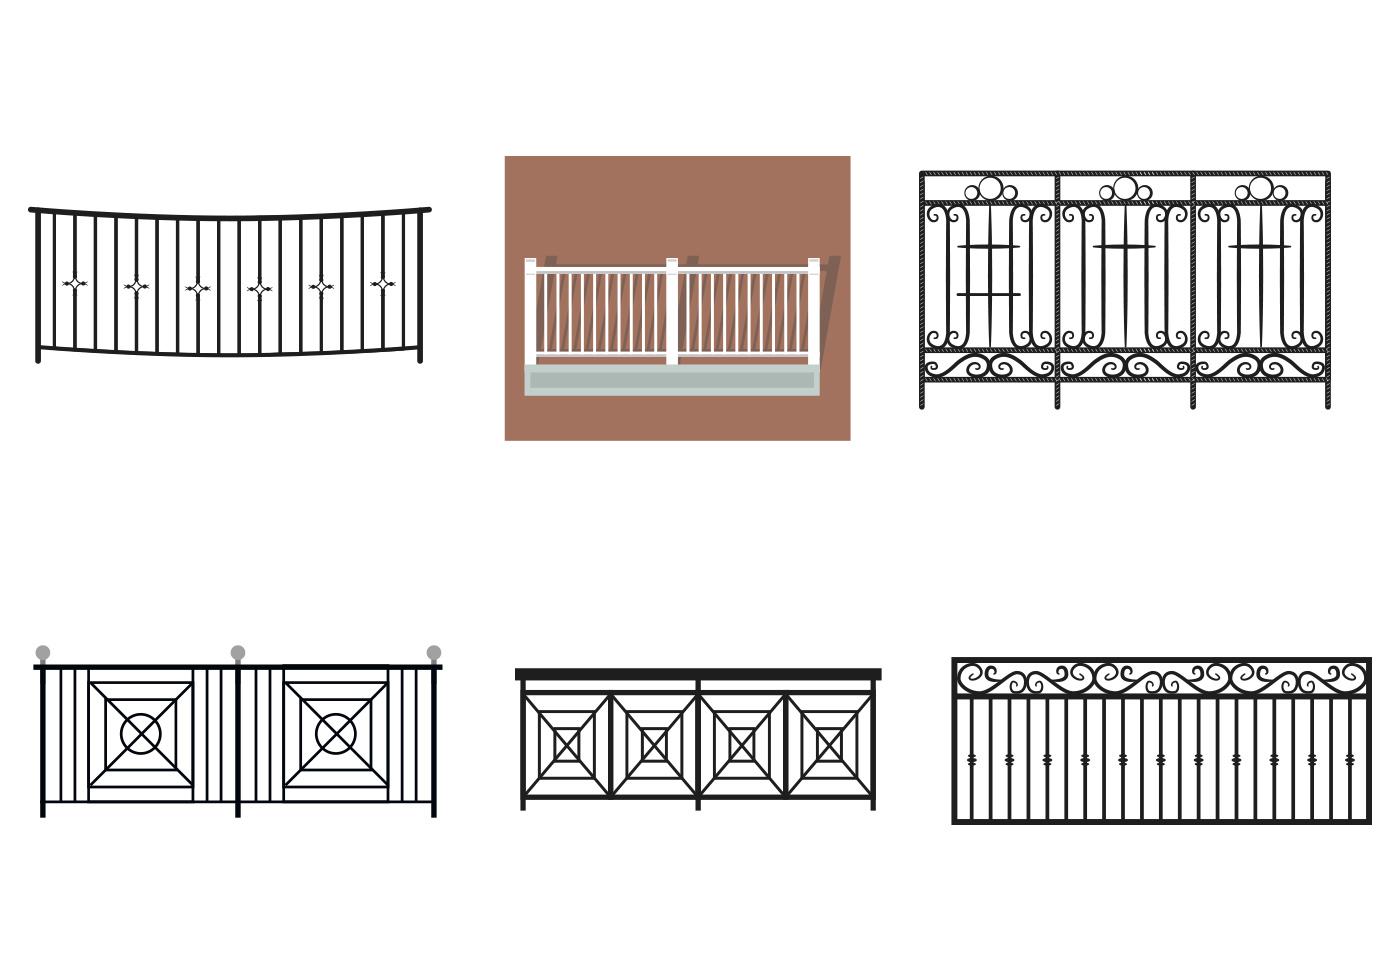 Balcony rail vectors download free vector art stock for Balcony vector